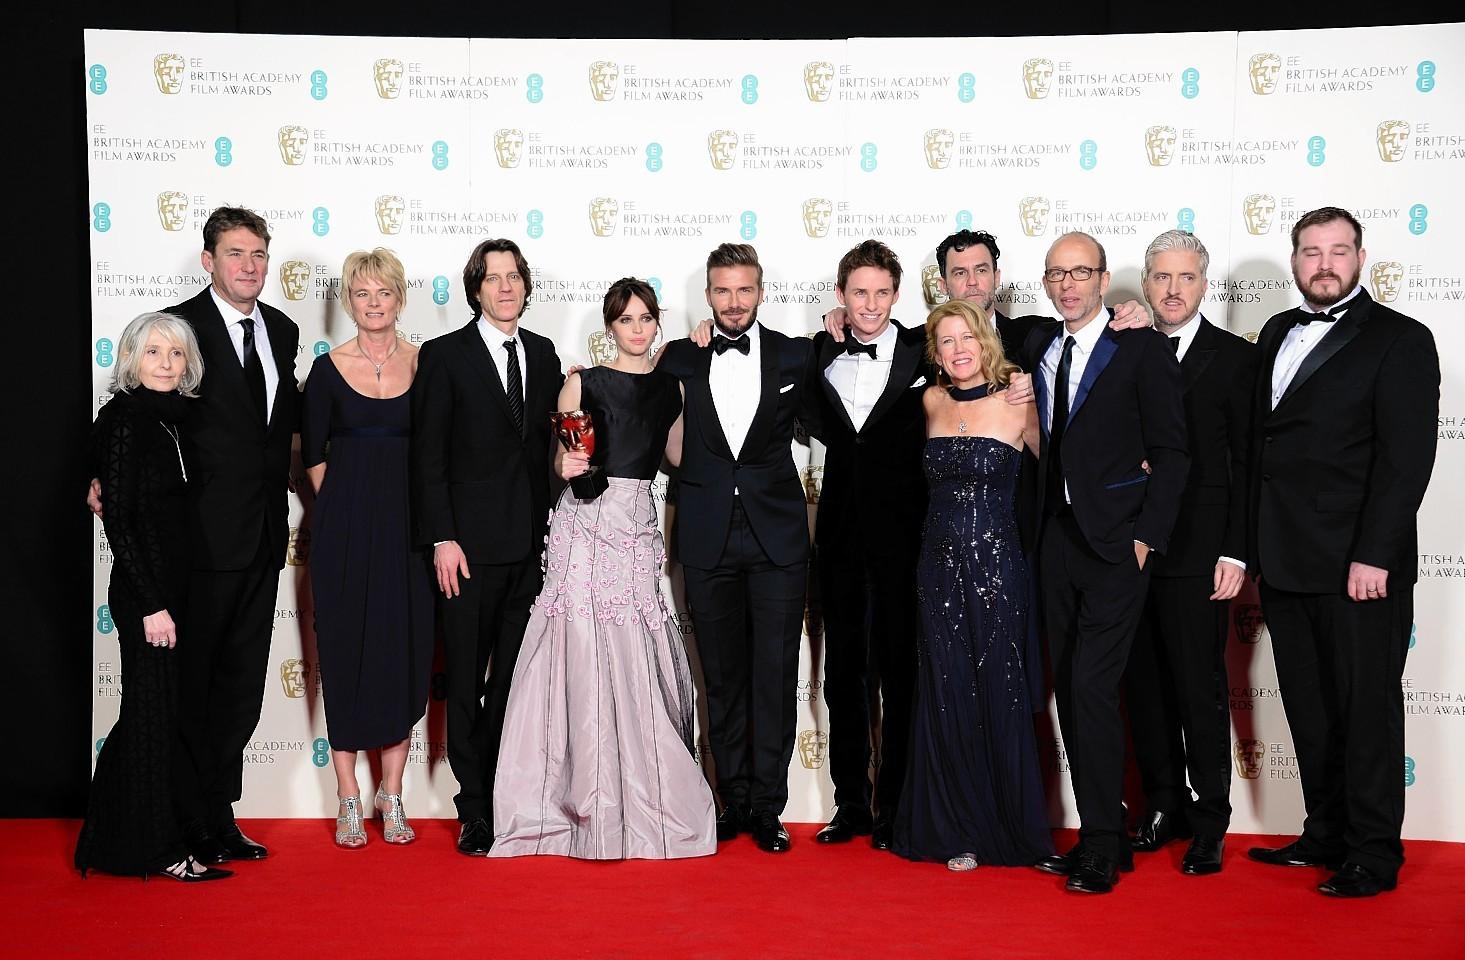 Bafta: BAFTA 2015 Winners: Grand Budapest, Boyhood And Hawking